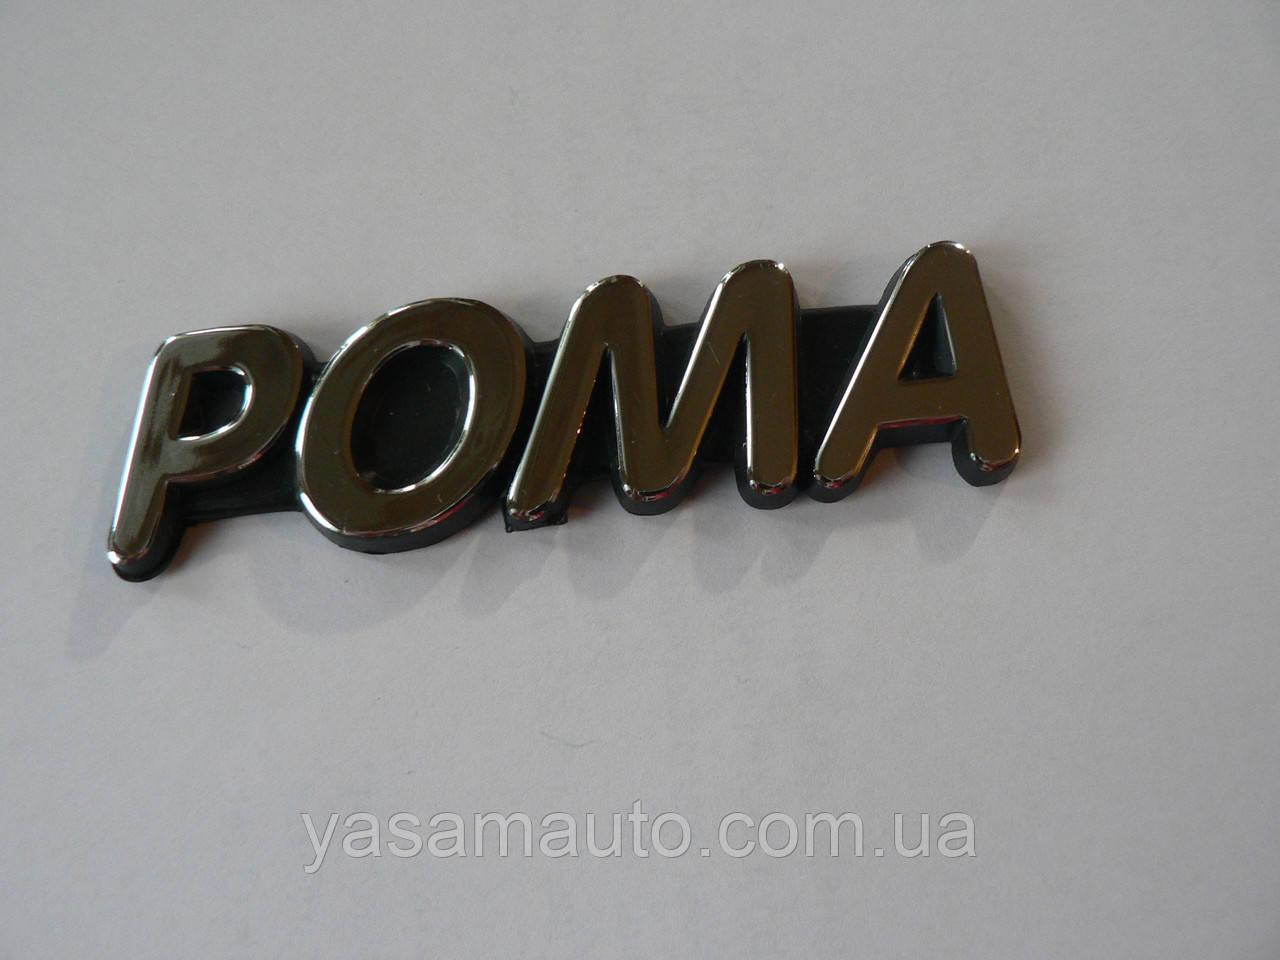 Наклейка pp имя мужское Рома 84х23х4мм пластиковая хромированные буквы надпись задняя на авто мальчика